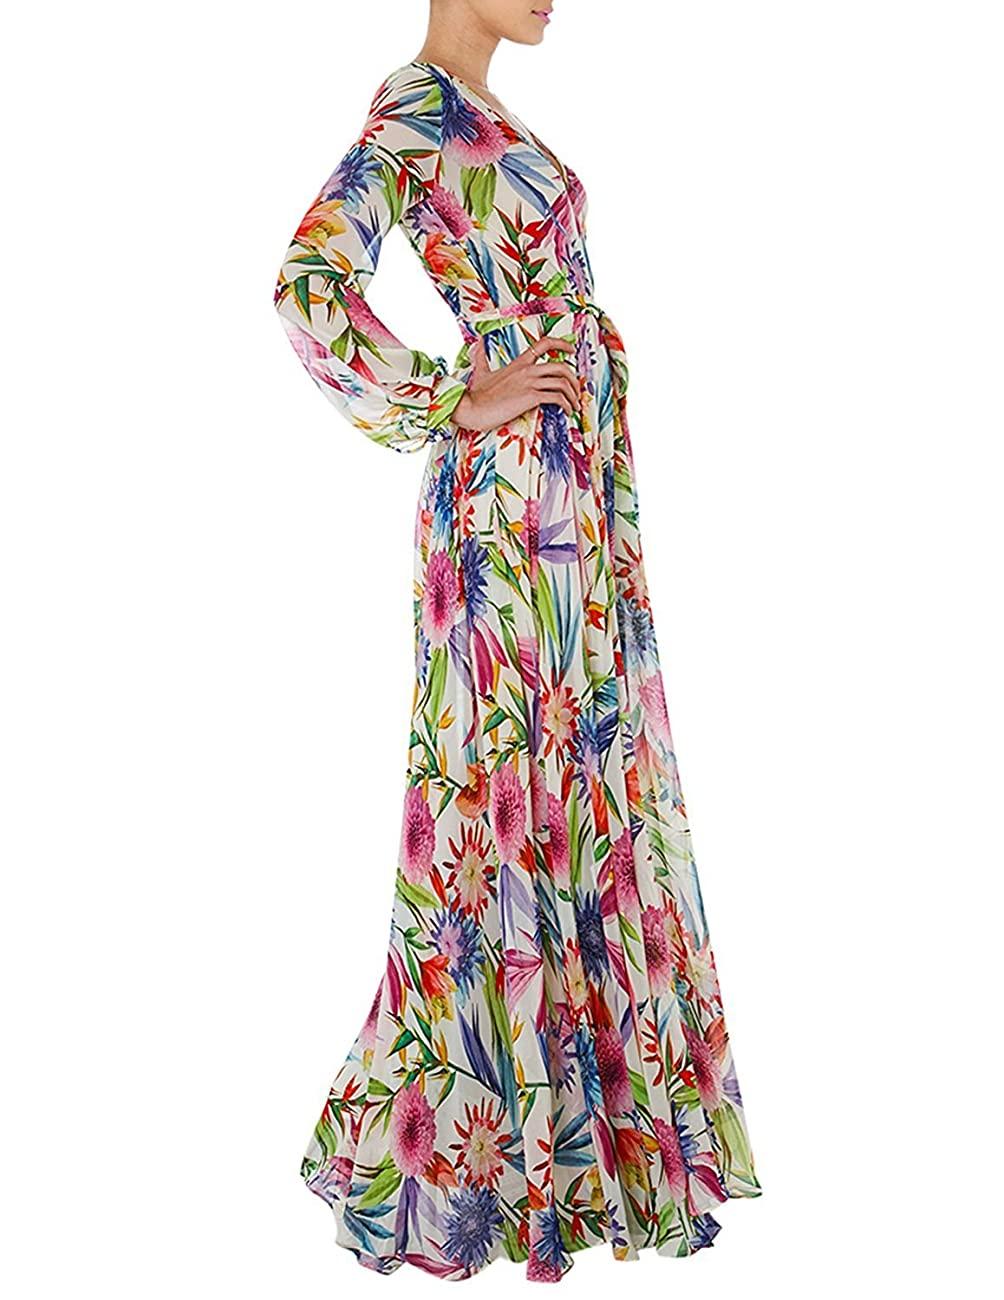 Haoyihui Vintage Style Chiffon V Neck Puff Pleated Wrap Long Maxi Full-Skirted Dress 3